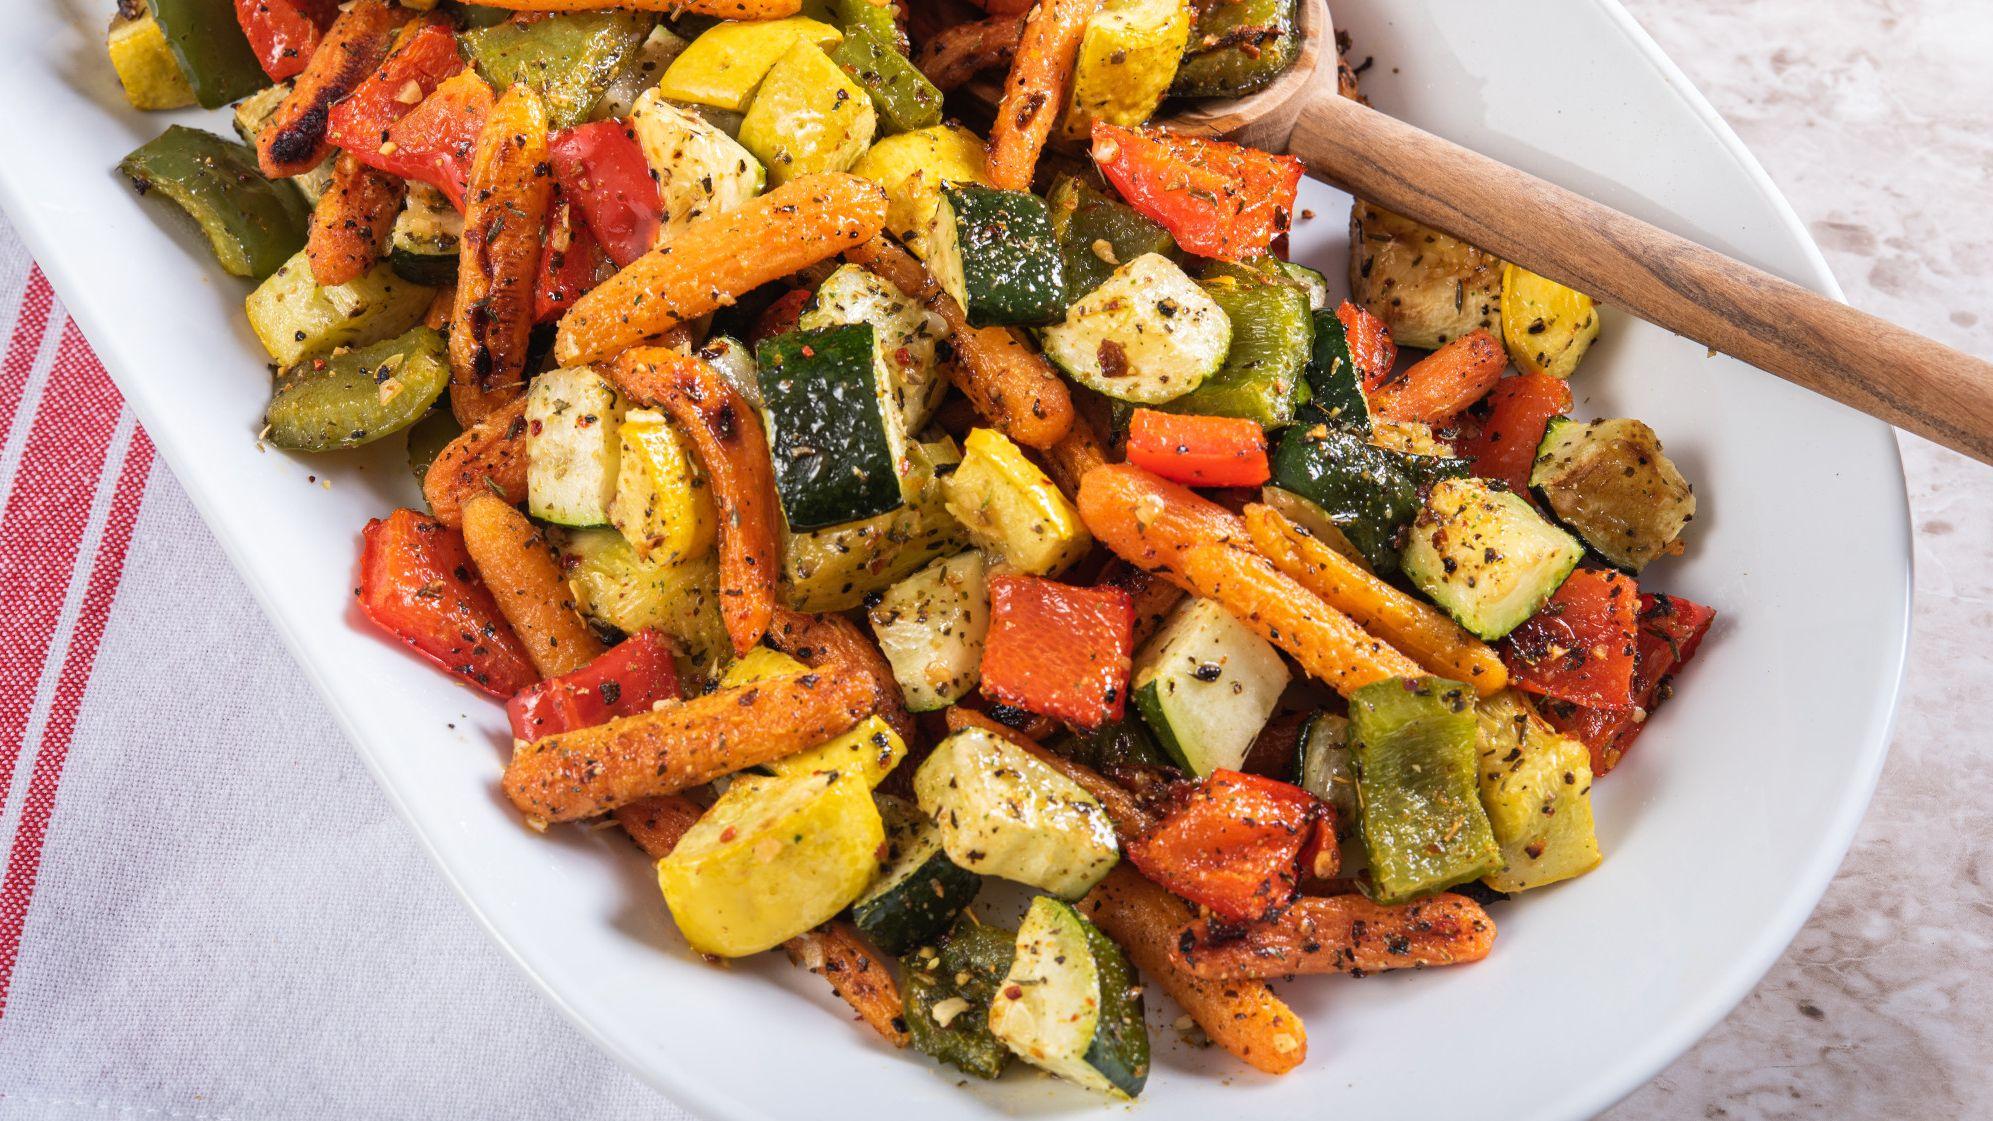 easy_roasted_vegetables_salt_free6130.jpg